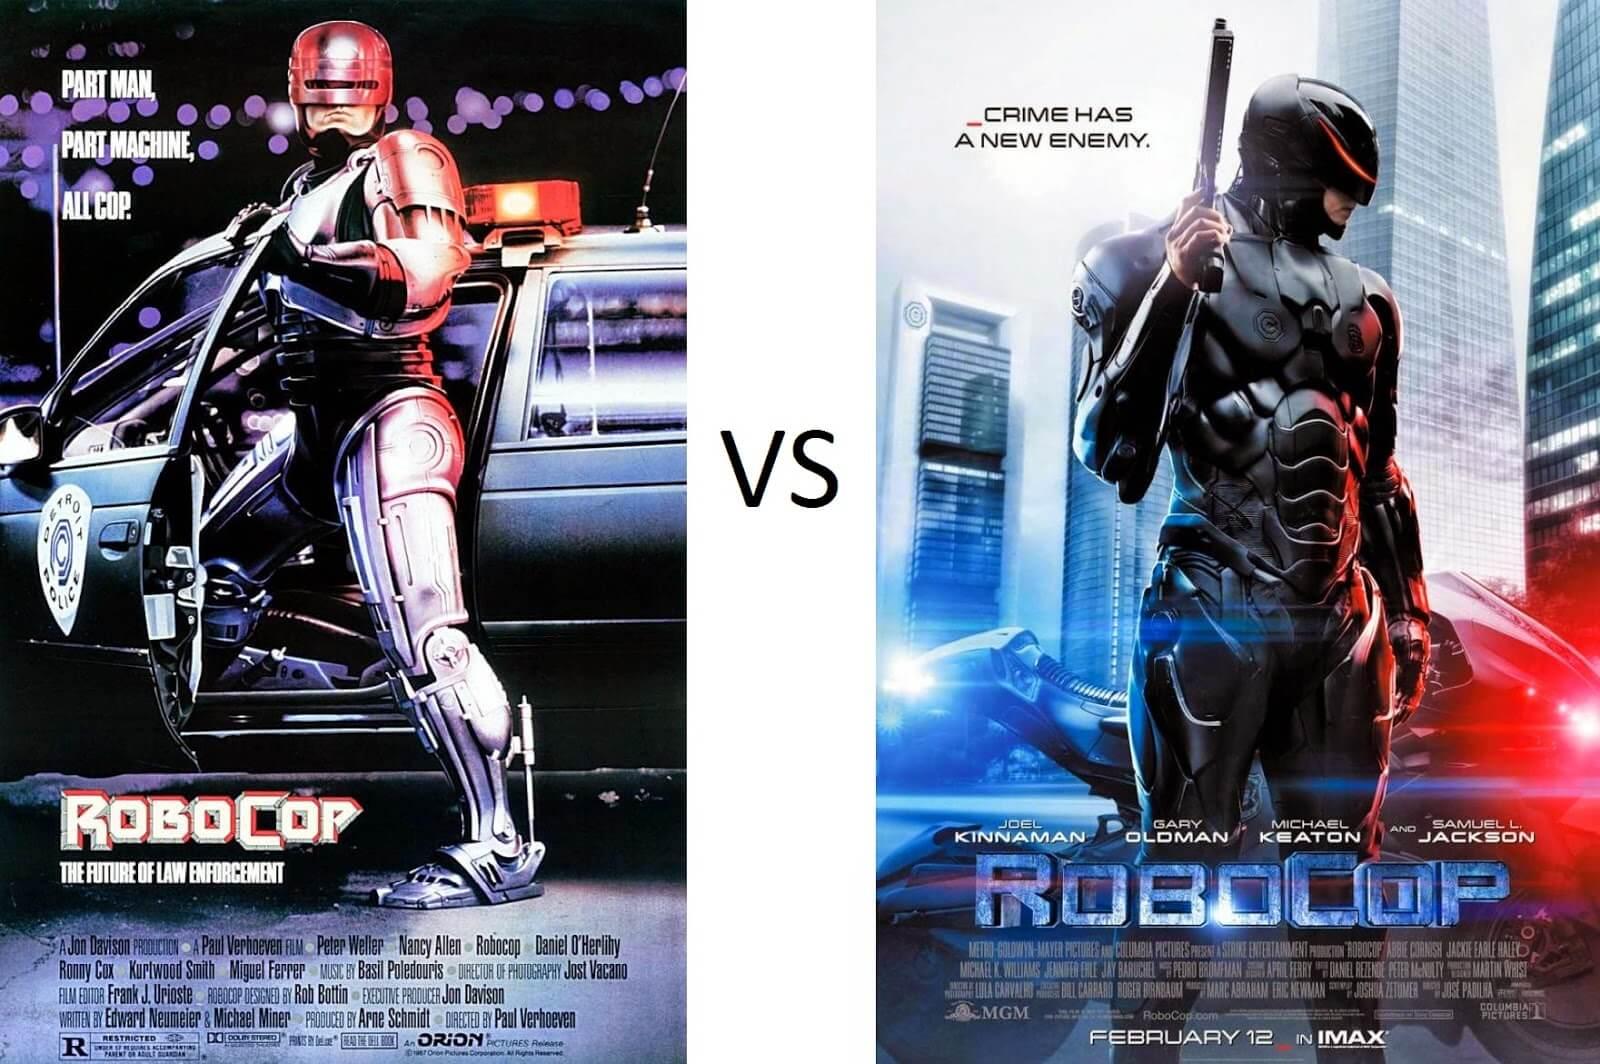 RoboCop (1987) vs RoboCop (2014)